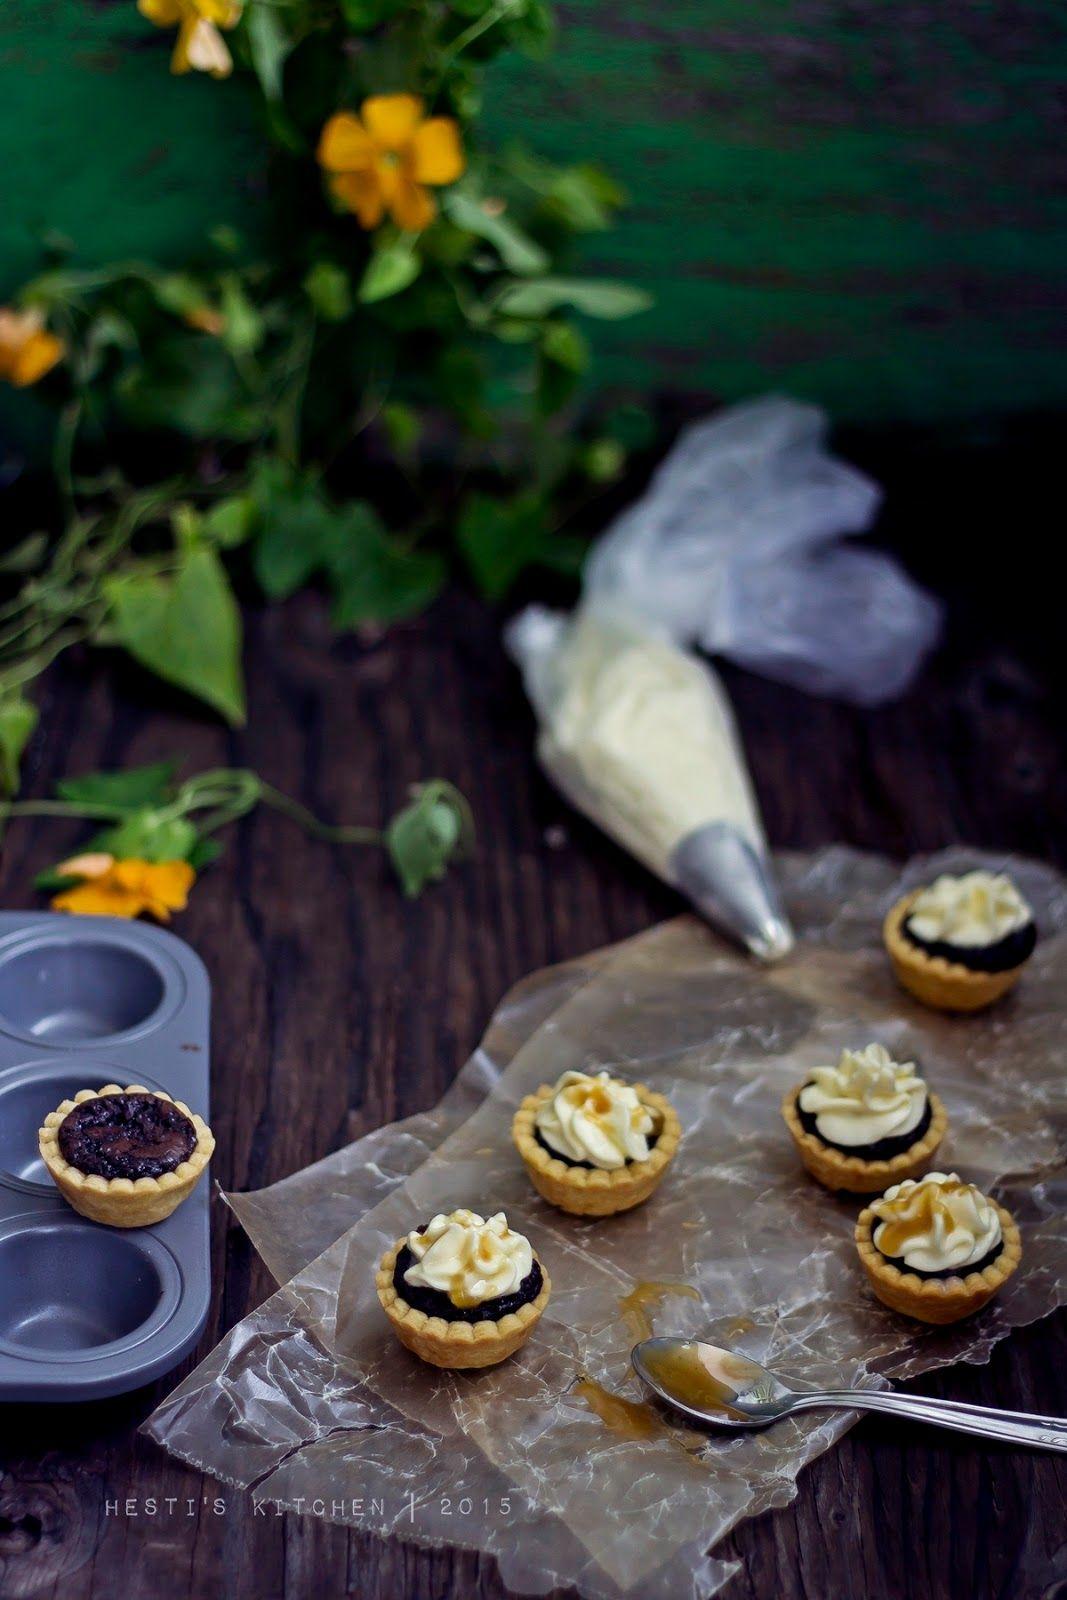 Hesti S Kitchen Yummy For Your Tummy Mini Brownie Pie With Butterscotch Sauce Makanan Dan Minuman Hidangan Penutup Ide Makanan